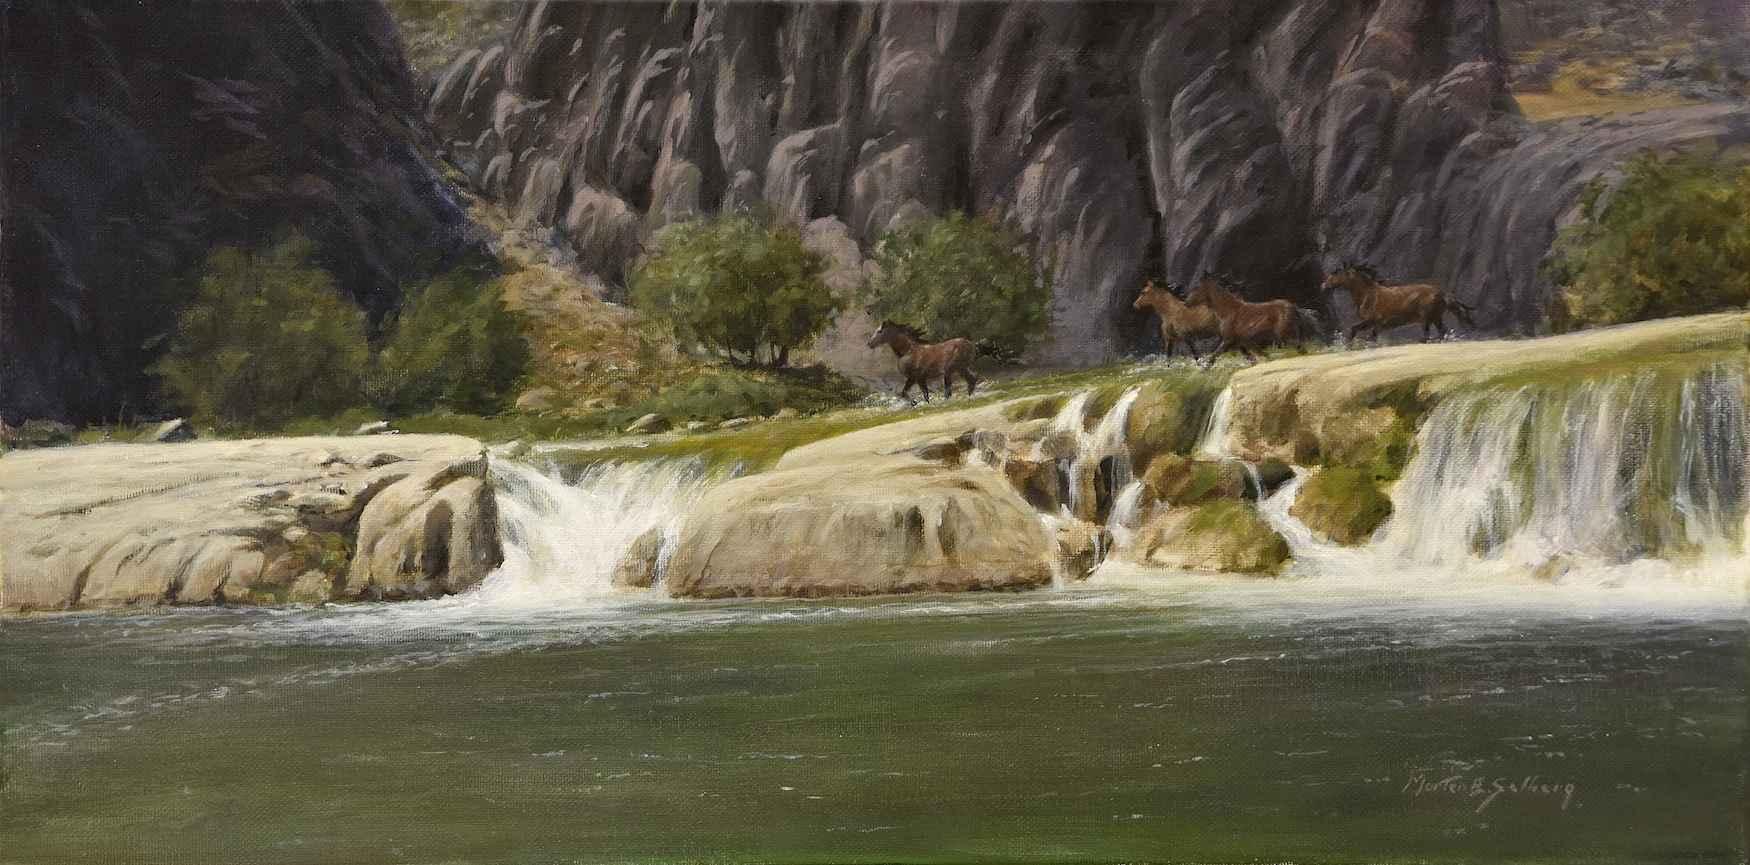 Wild Horse Canyon by  Morten E. Solberg - Masterpiece Online